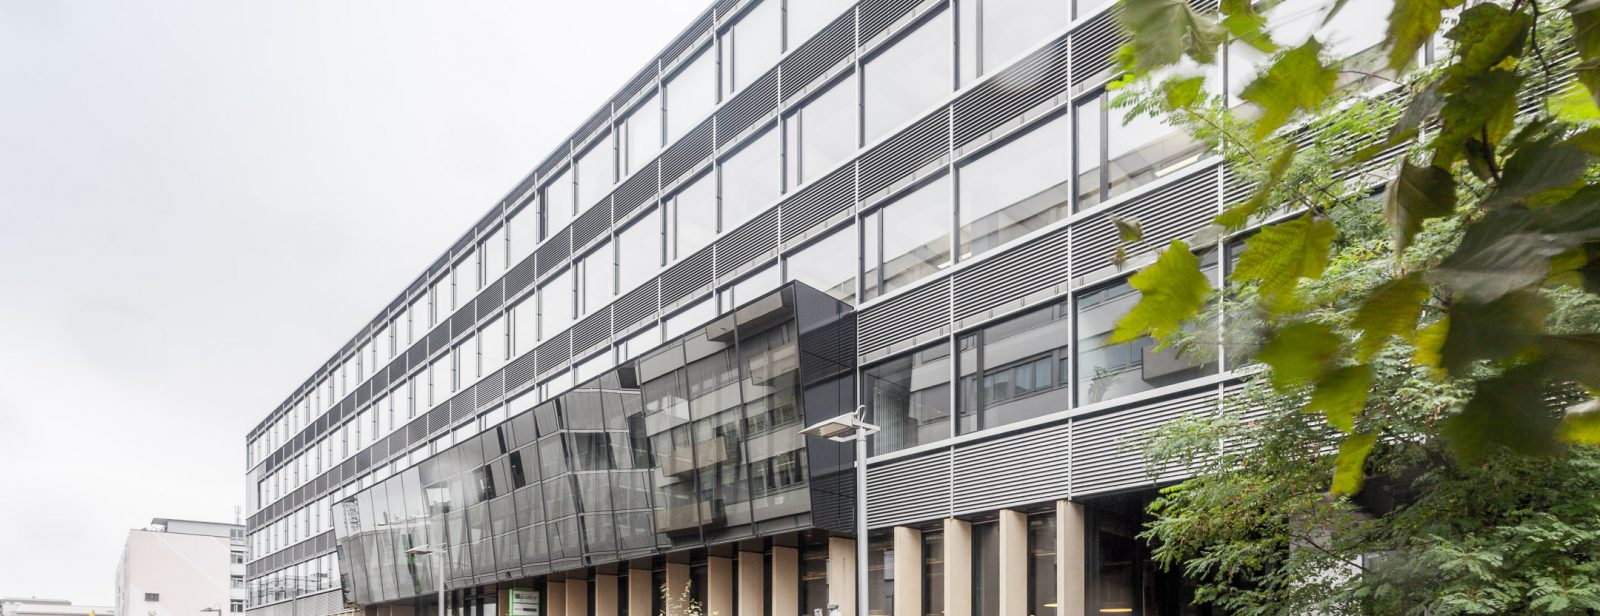 Bürogebäude Integra Immobilien, Wallisellen